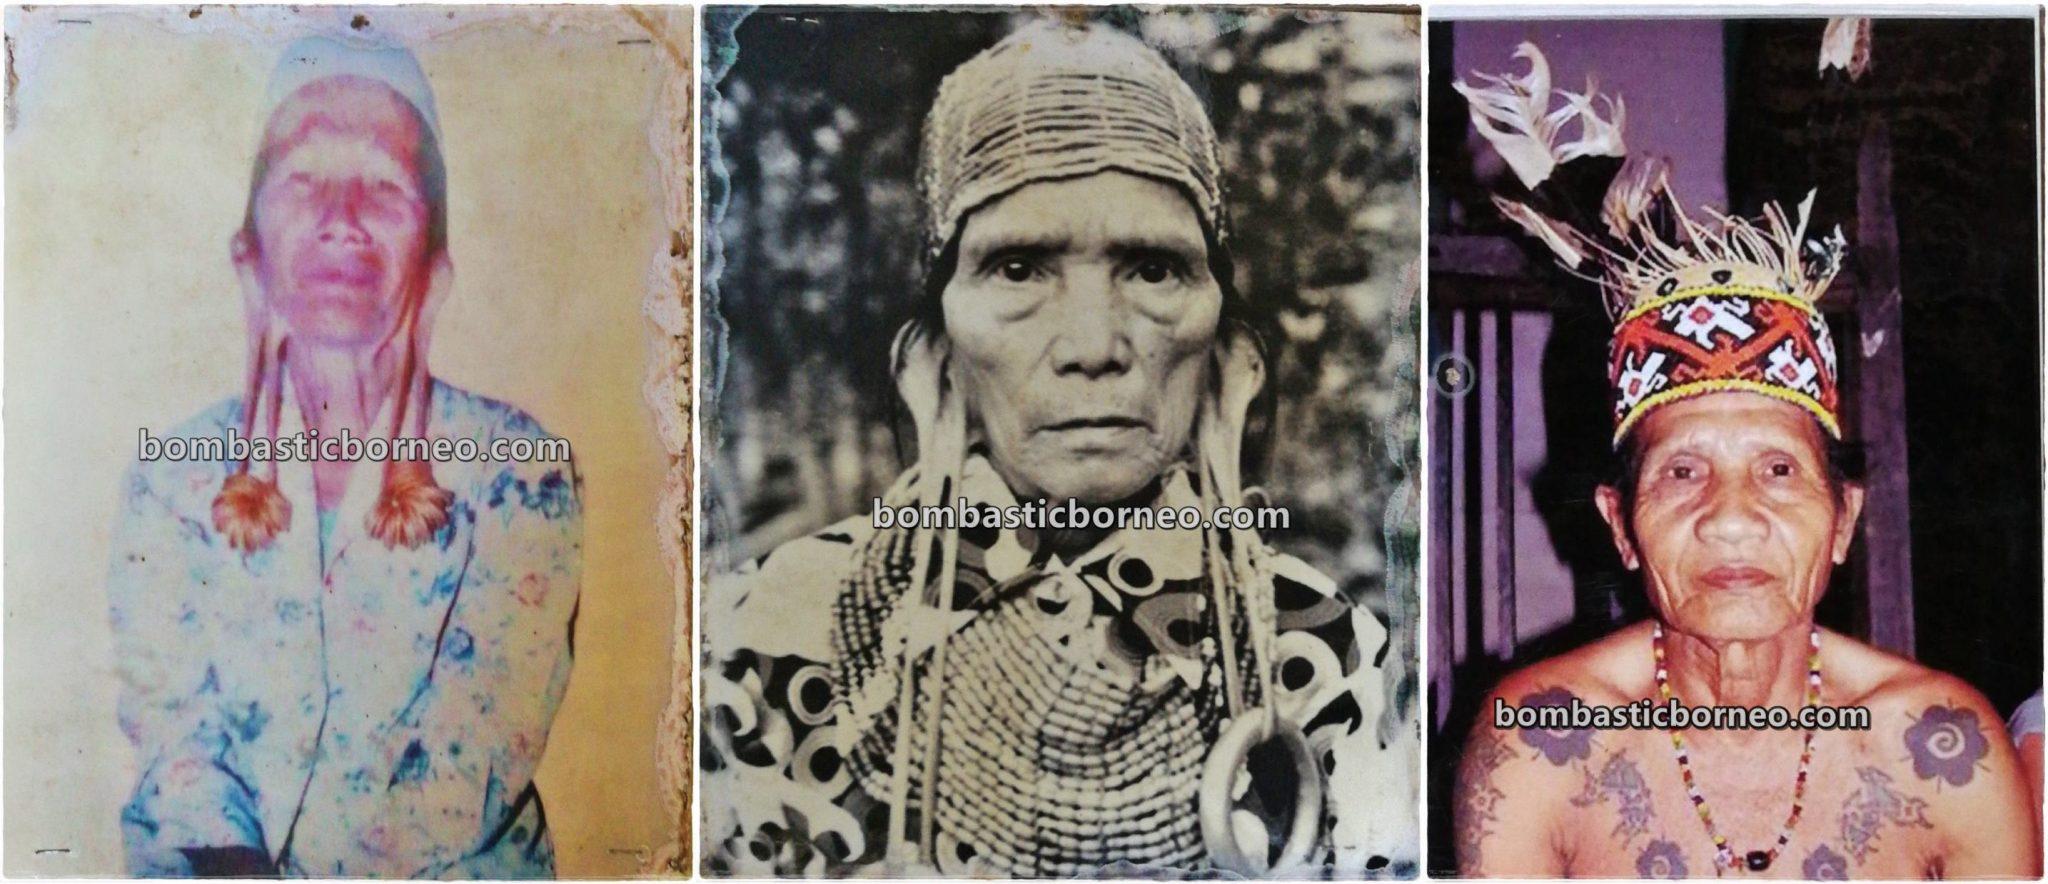 Panglima Siru, Sifu, Shaman, budaya, Ethnic, native, history, Indonesia, Kalimantan Barat, Bengkayang, Travel, village, Trans Border, 婆罗洲原住民达雅, 印尼西加里曼丹,